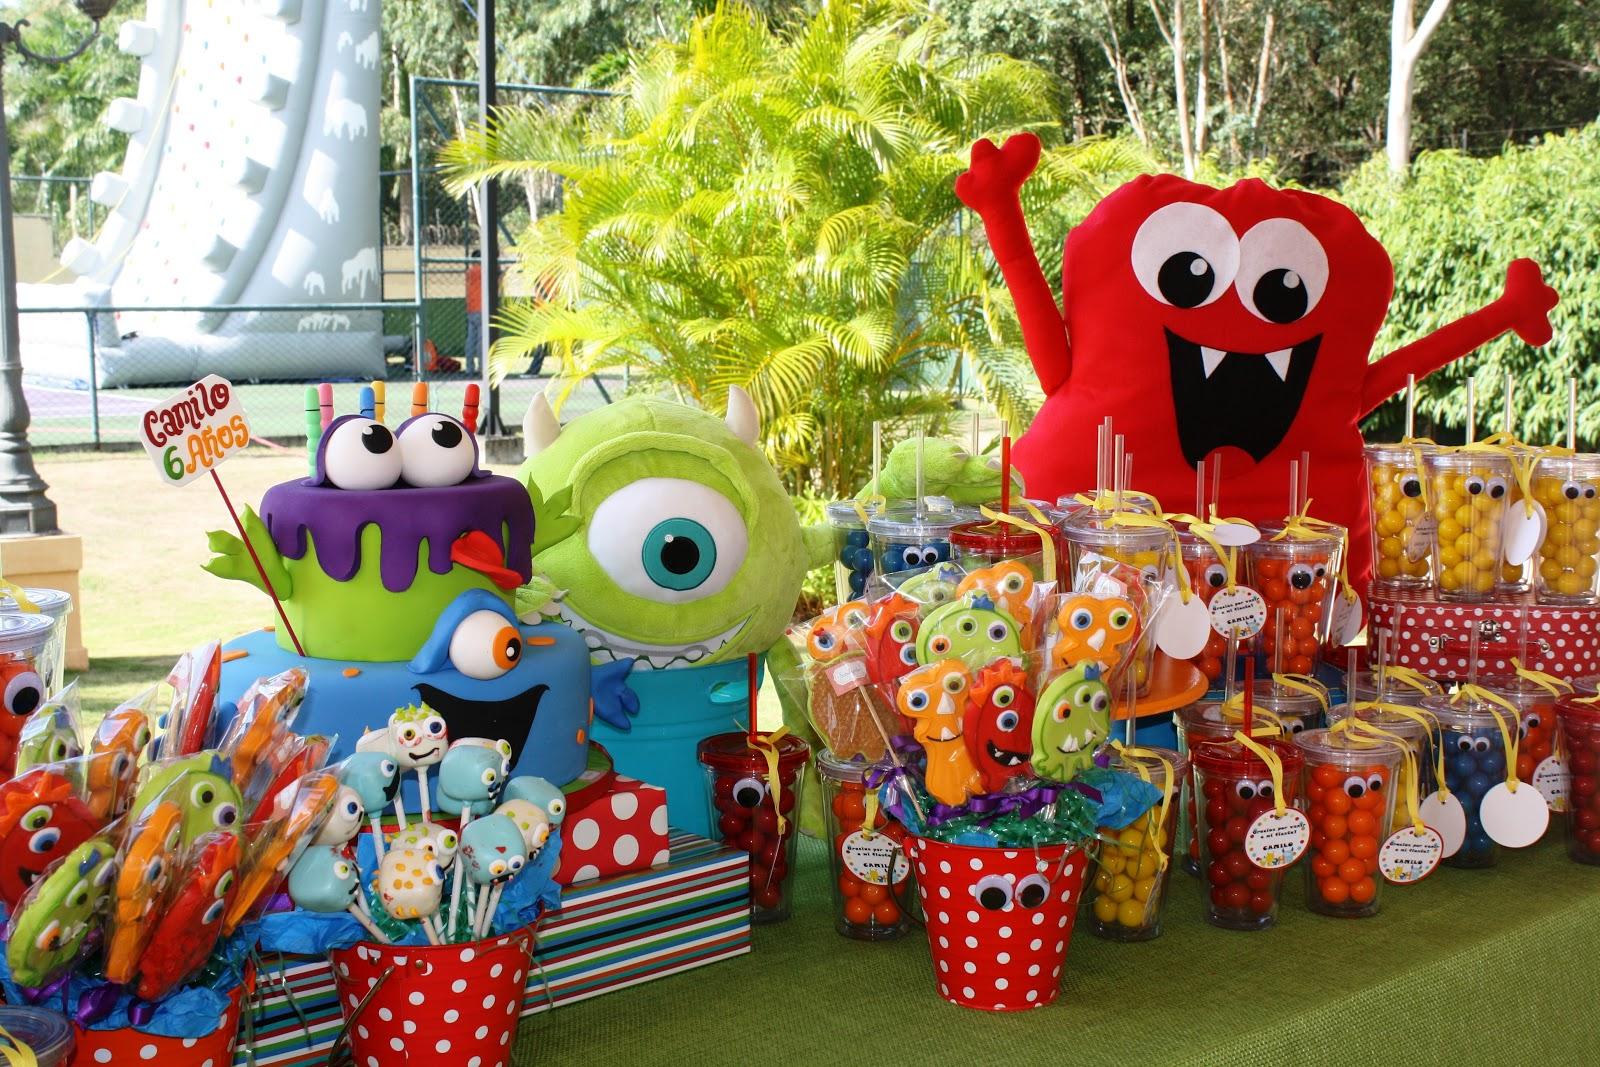 Fiesta Monstruos Divertidosfesta on Halloween Recycled Bottle Monster